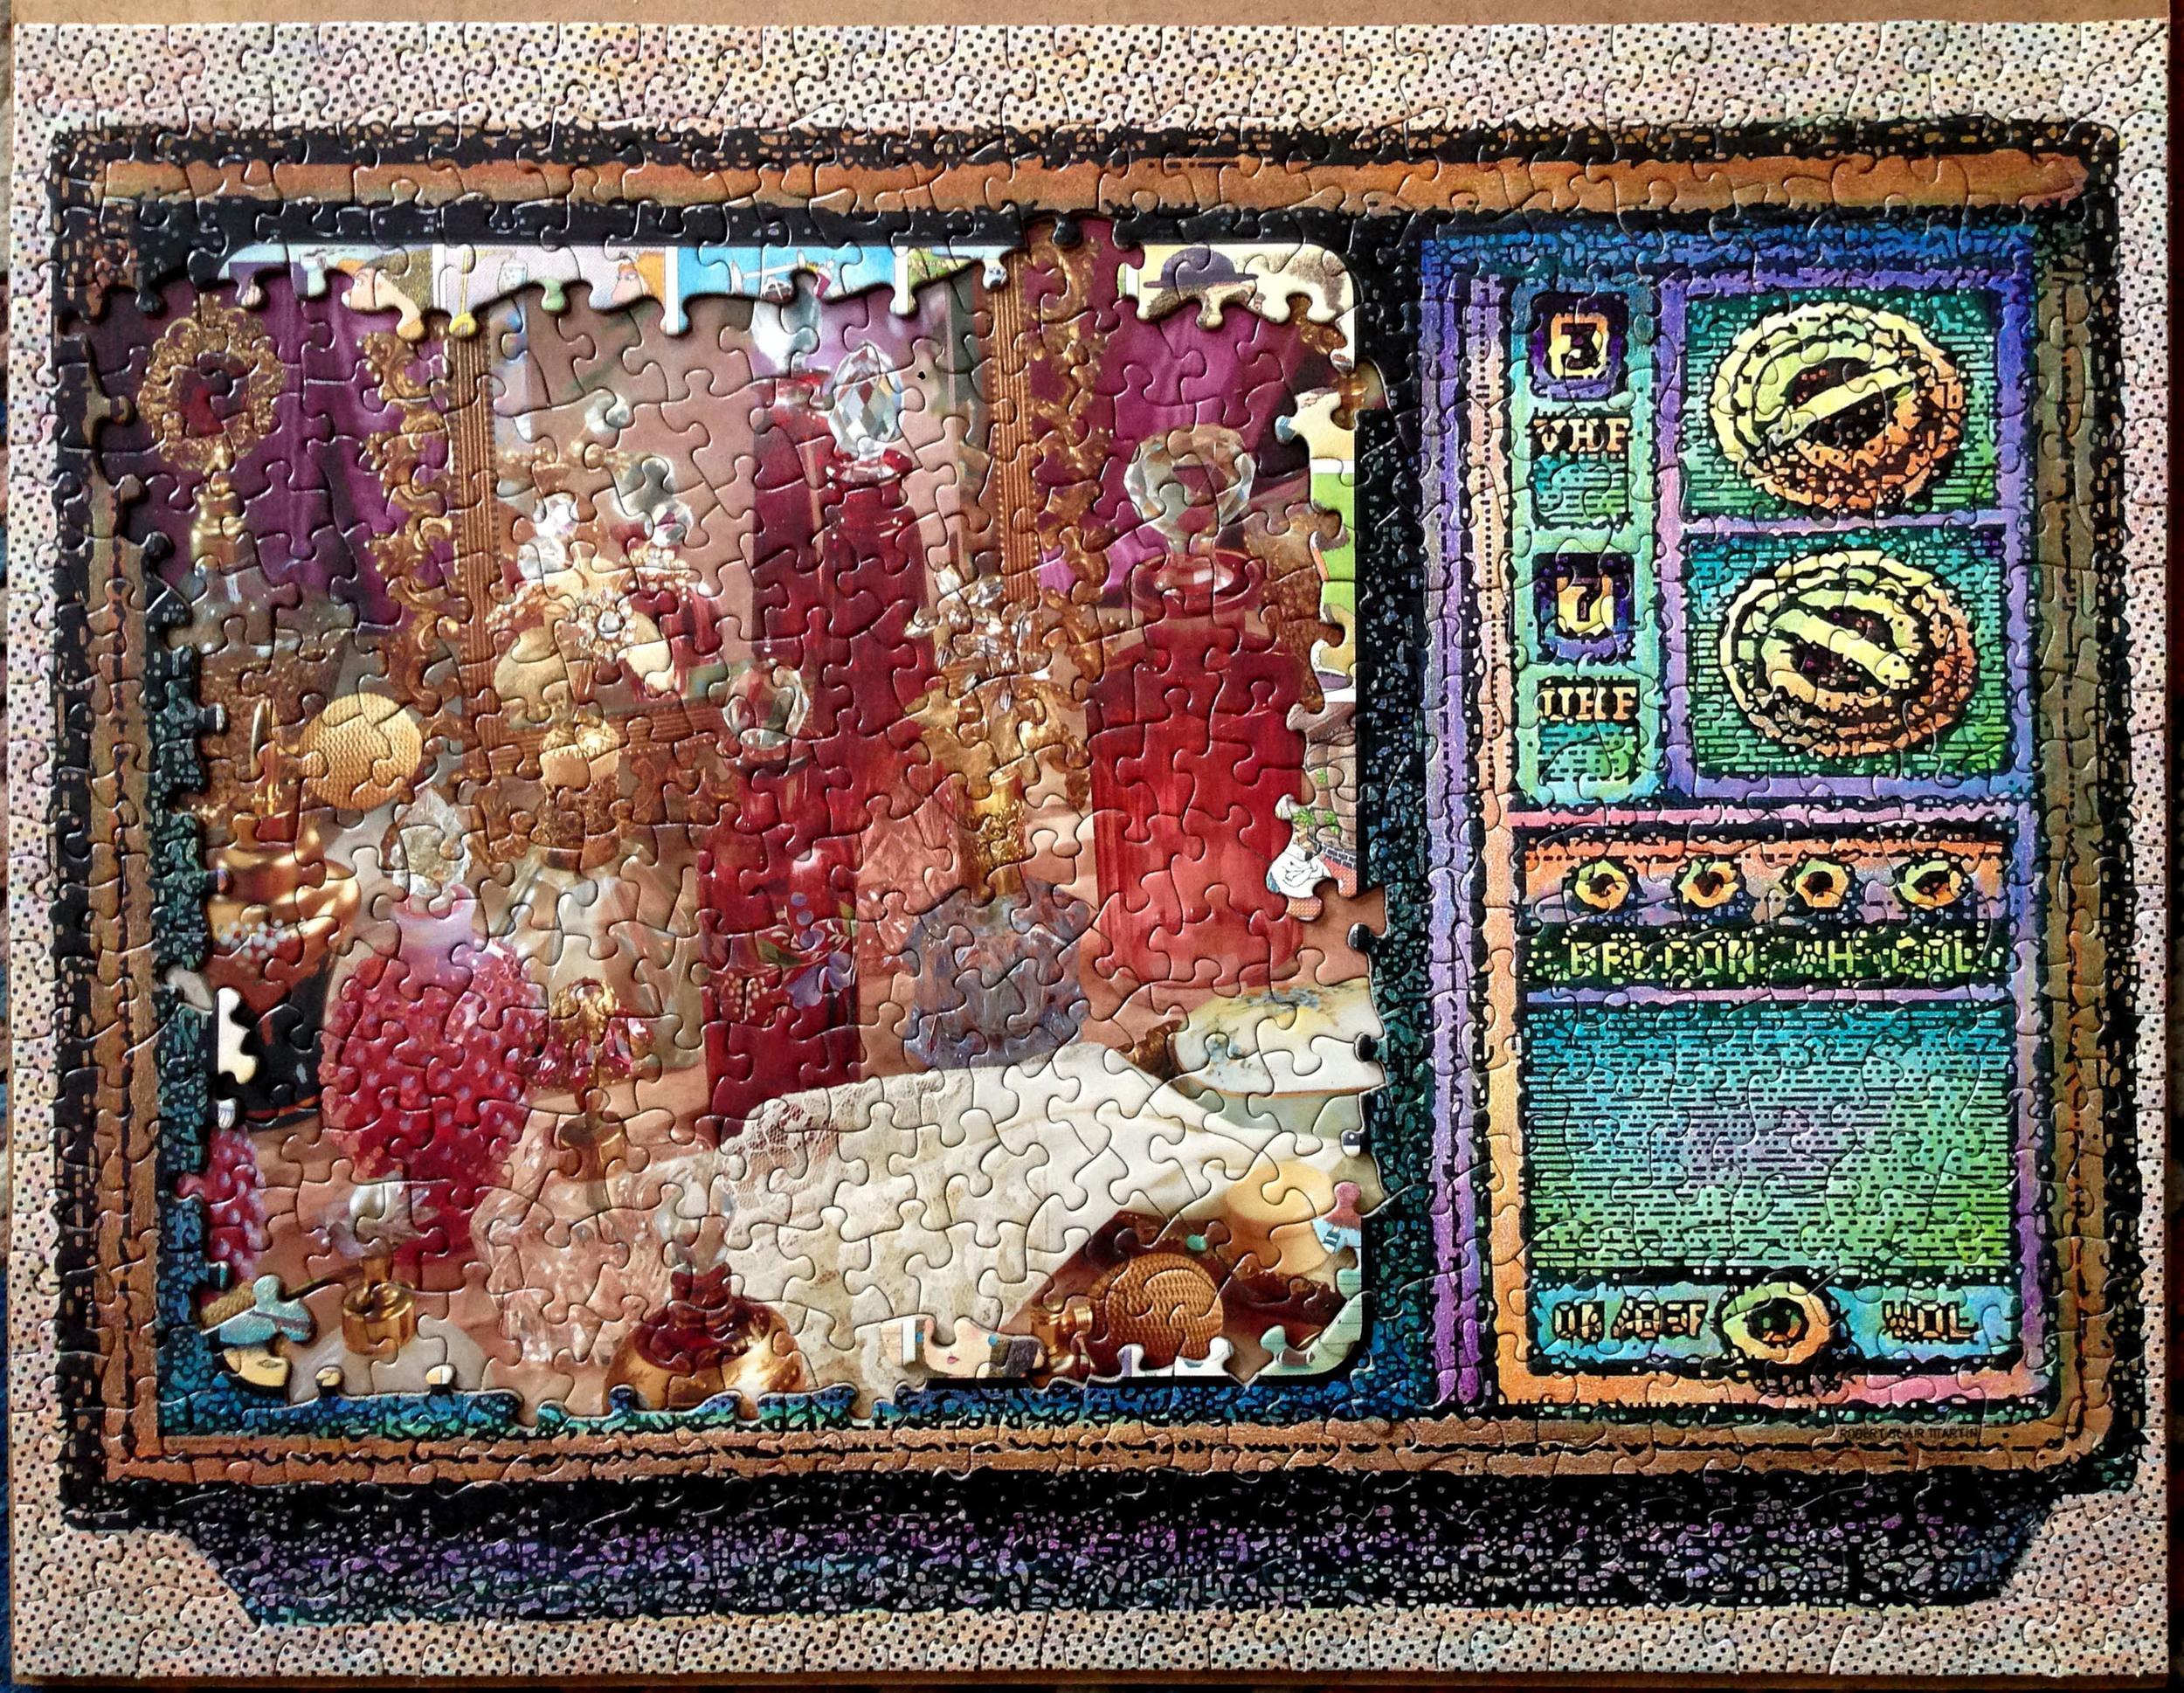 QVC, Puzzle Collage